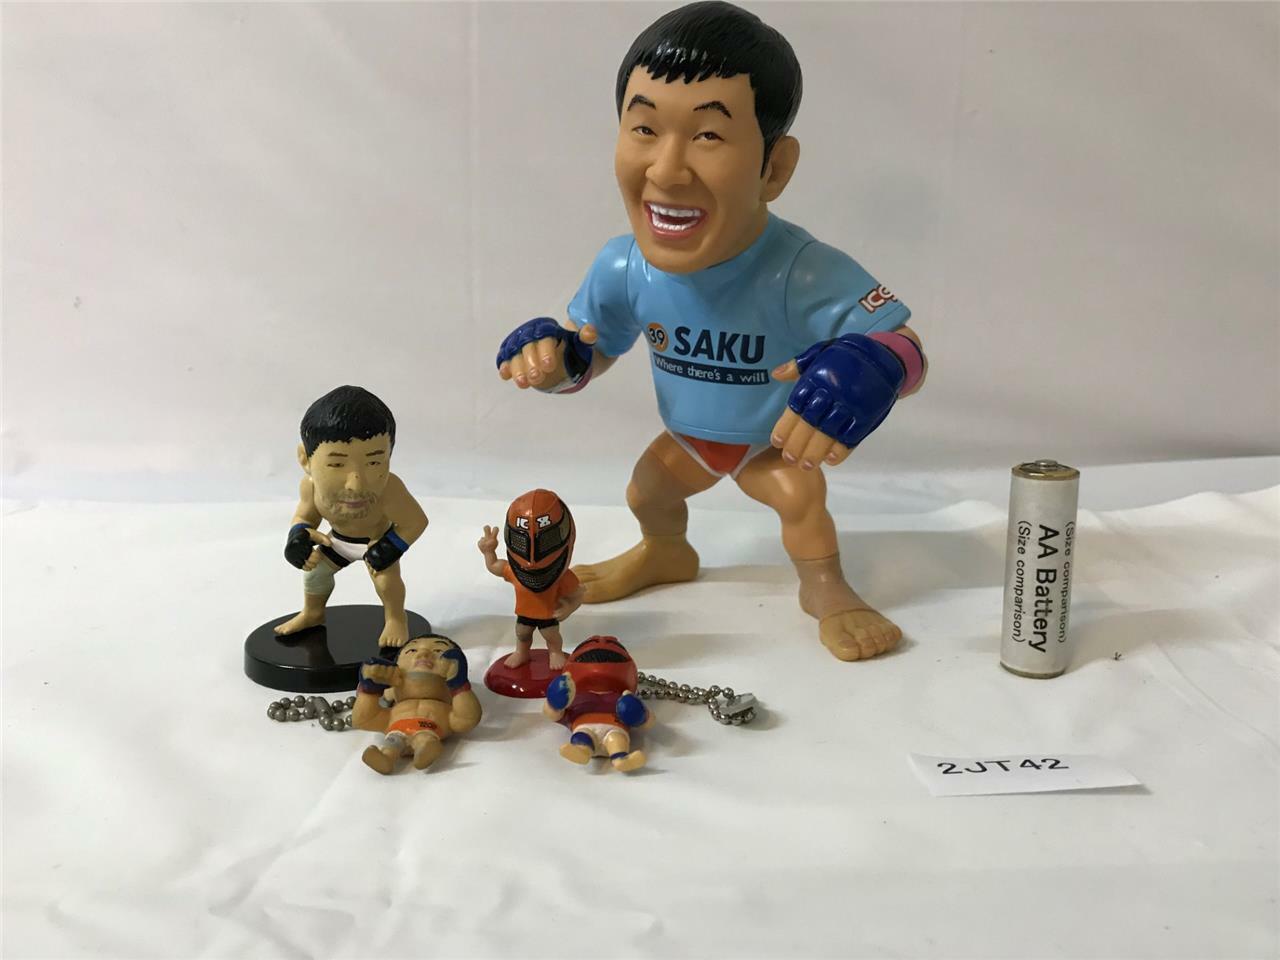 KAZUSHI SAKURABA bambola  PRIDE UFC HAO  COLLECTION UFC mini cifra set  nuovo sadico